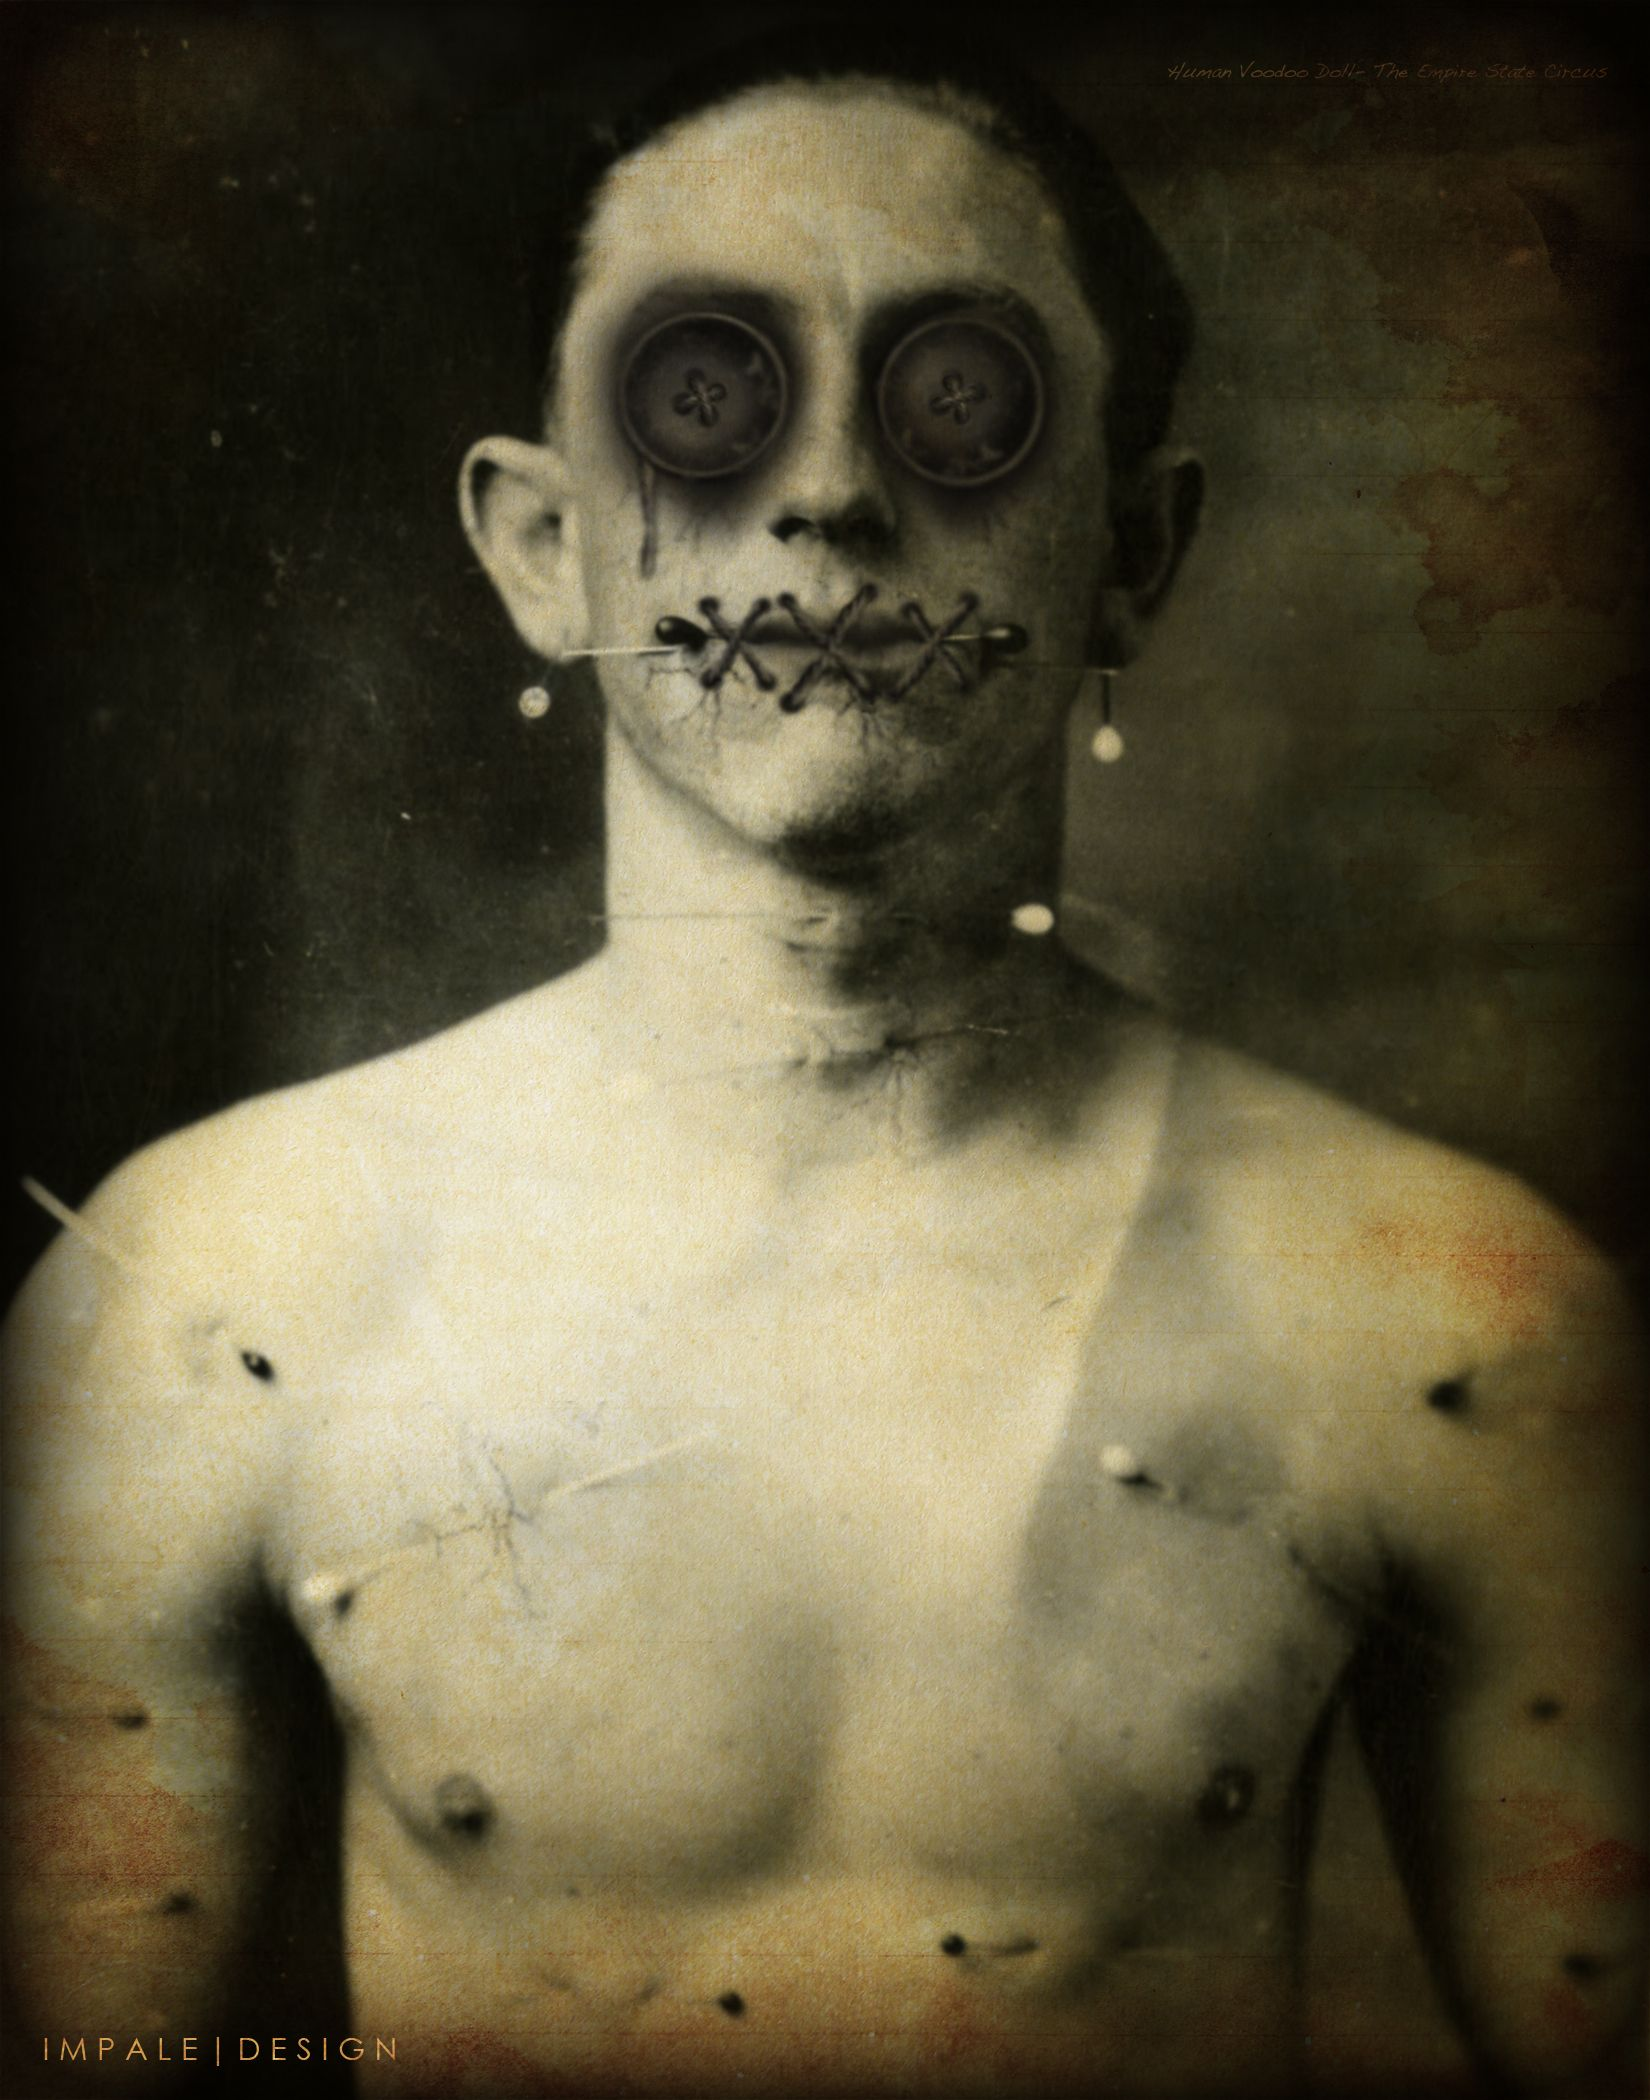 Human Voodoo Doll halloween costume